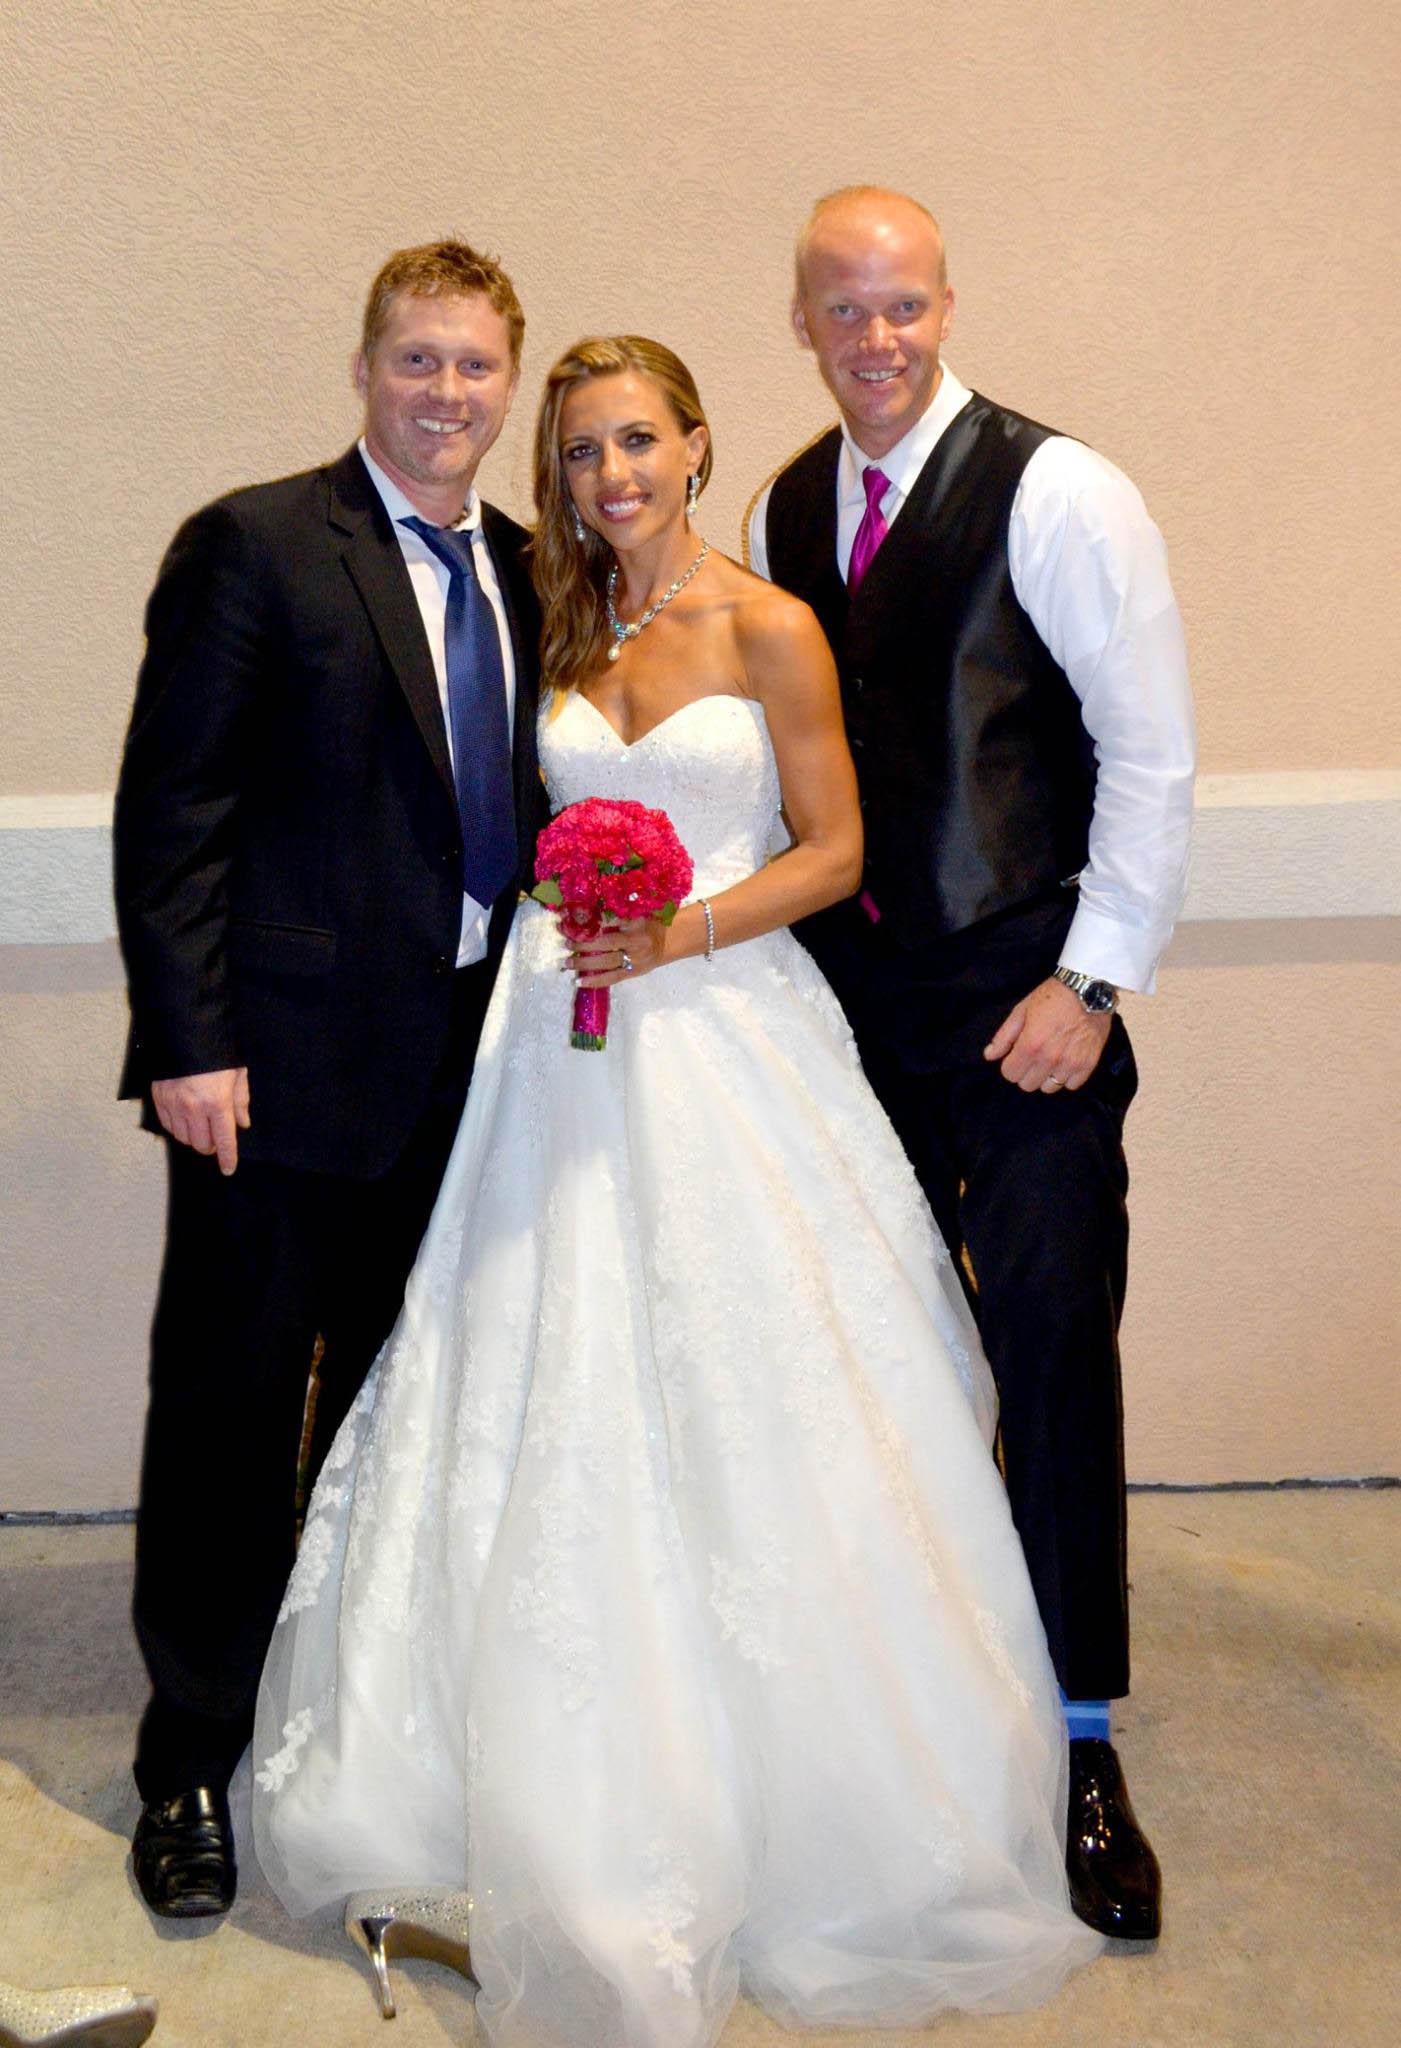 2015.08.22 - Wesele Ewa & Kevin Zator, Dj MAJK Chicago.jpg